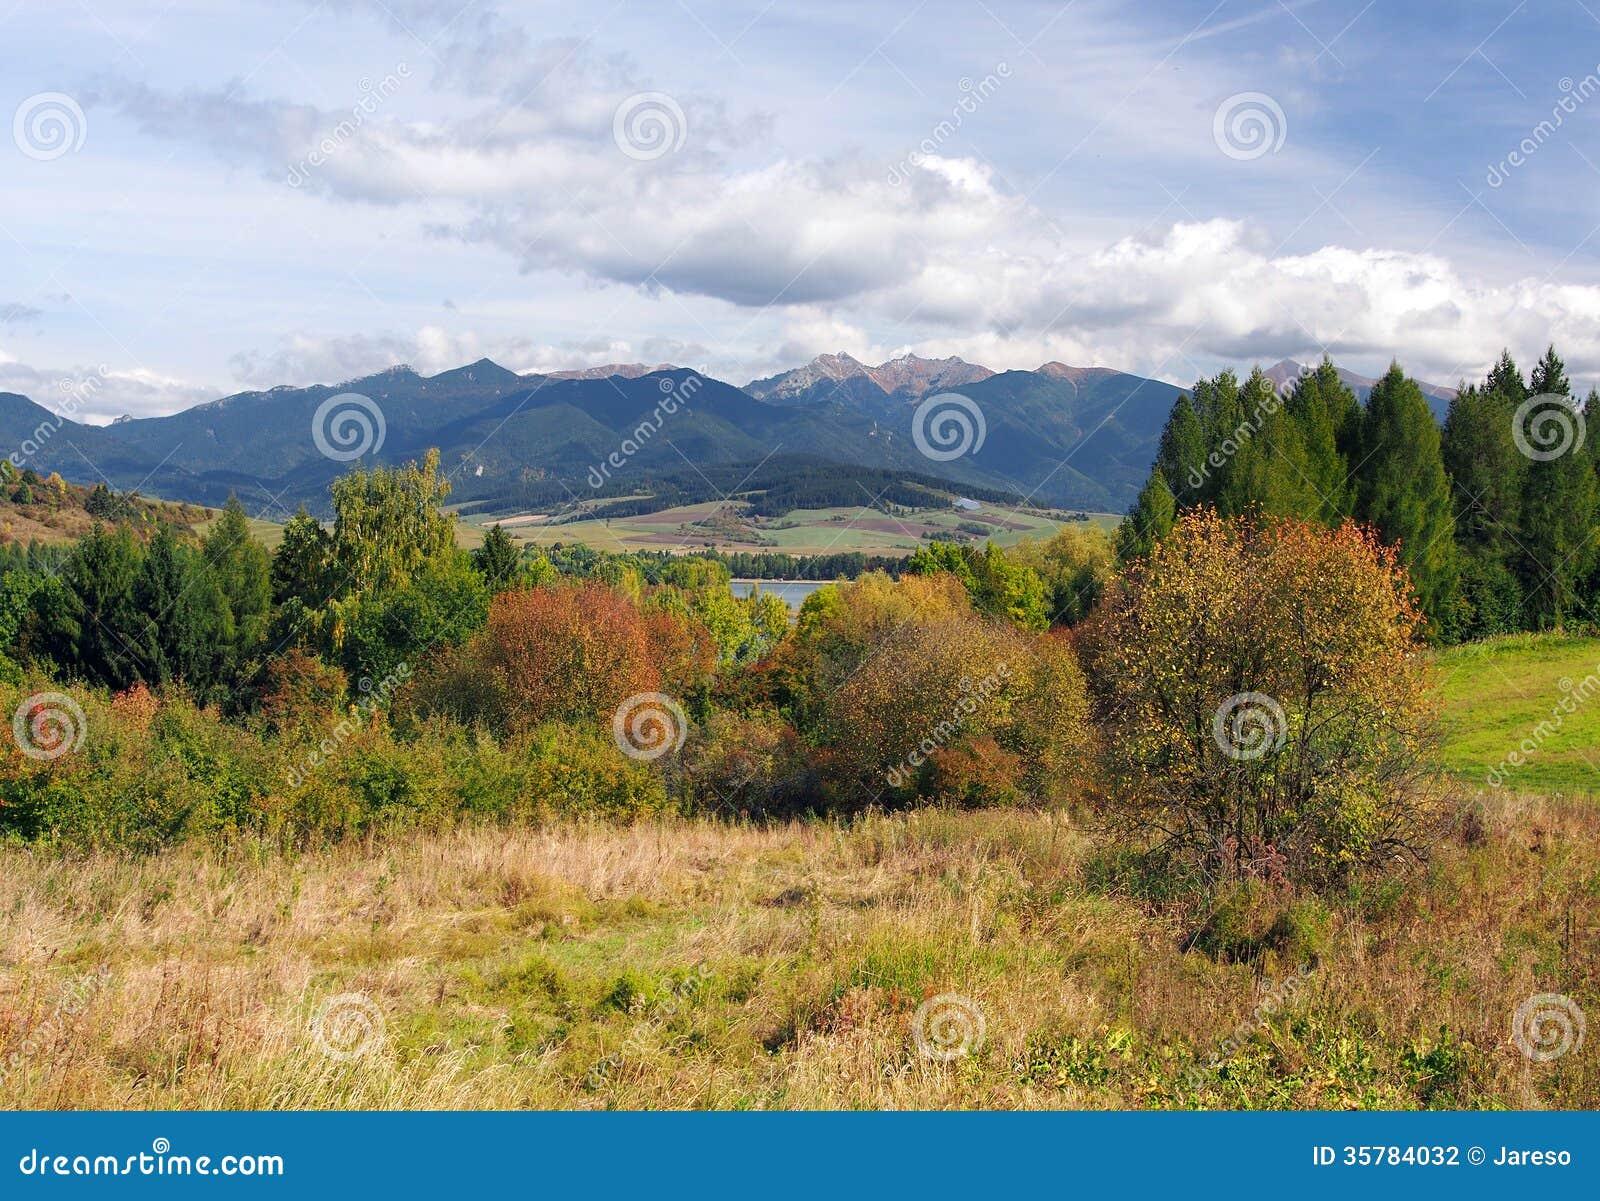 Rohace mountains in Liptov, Slovakia